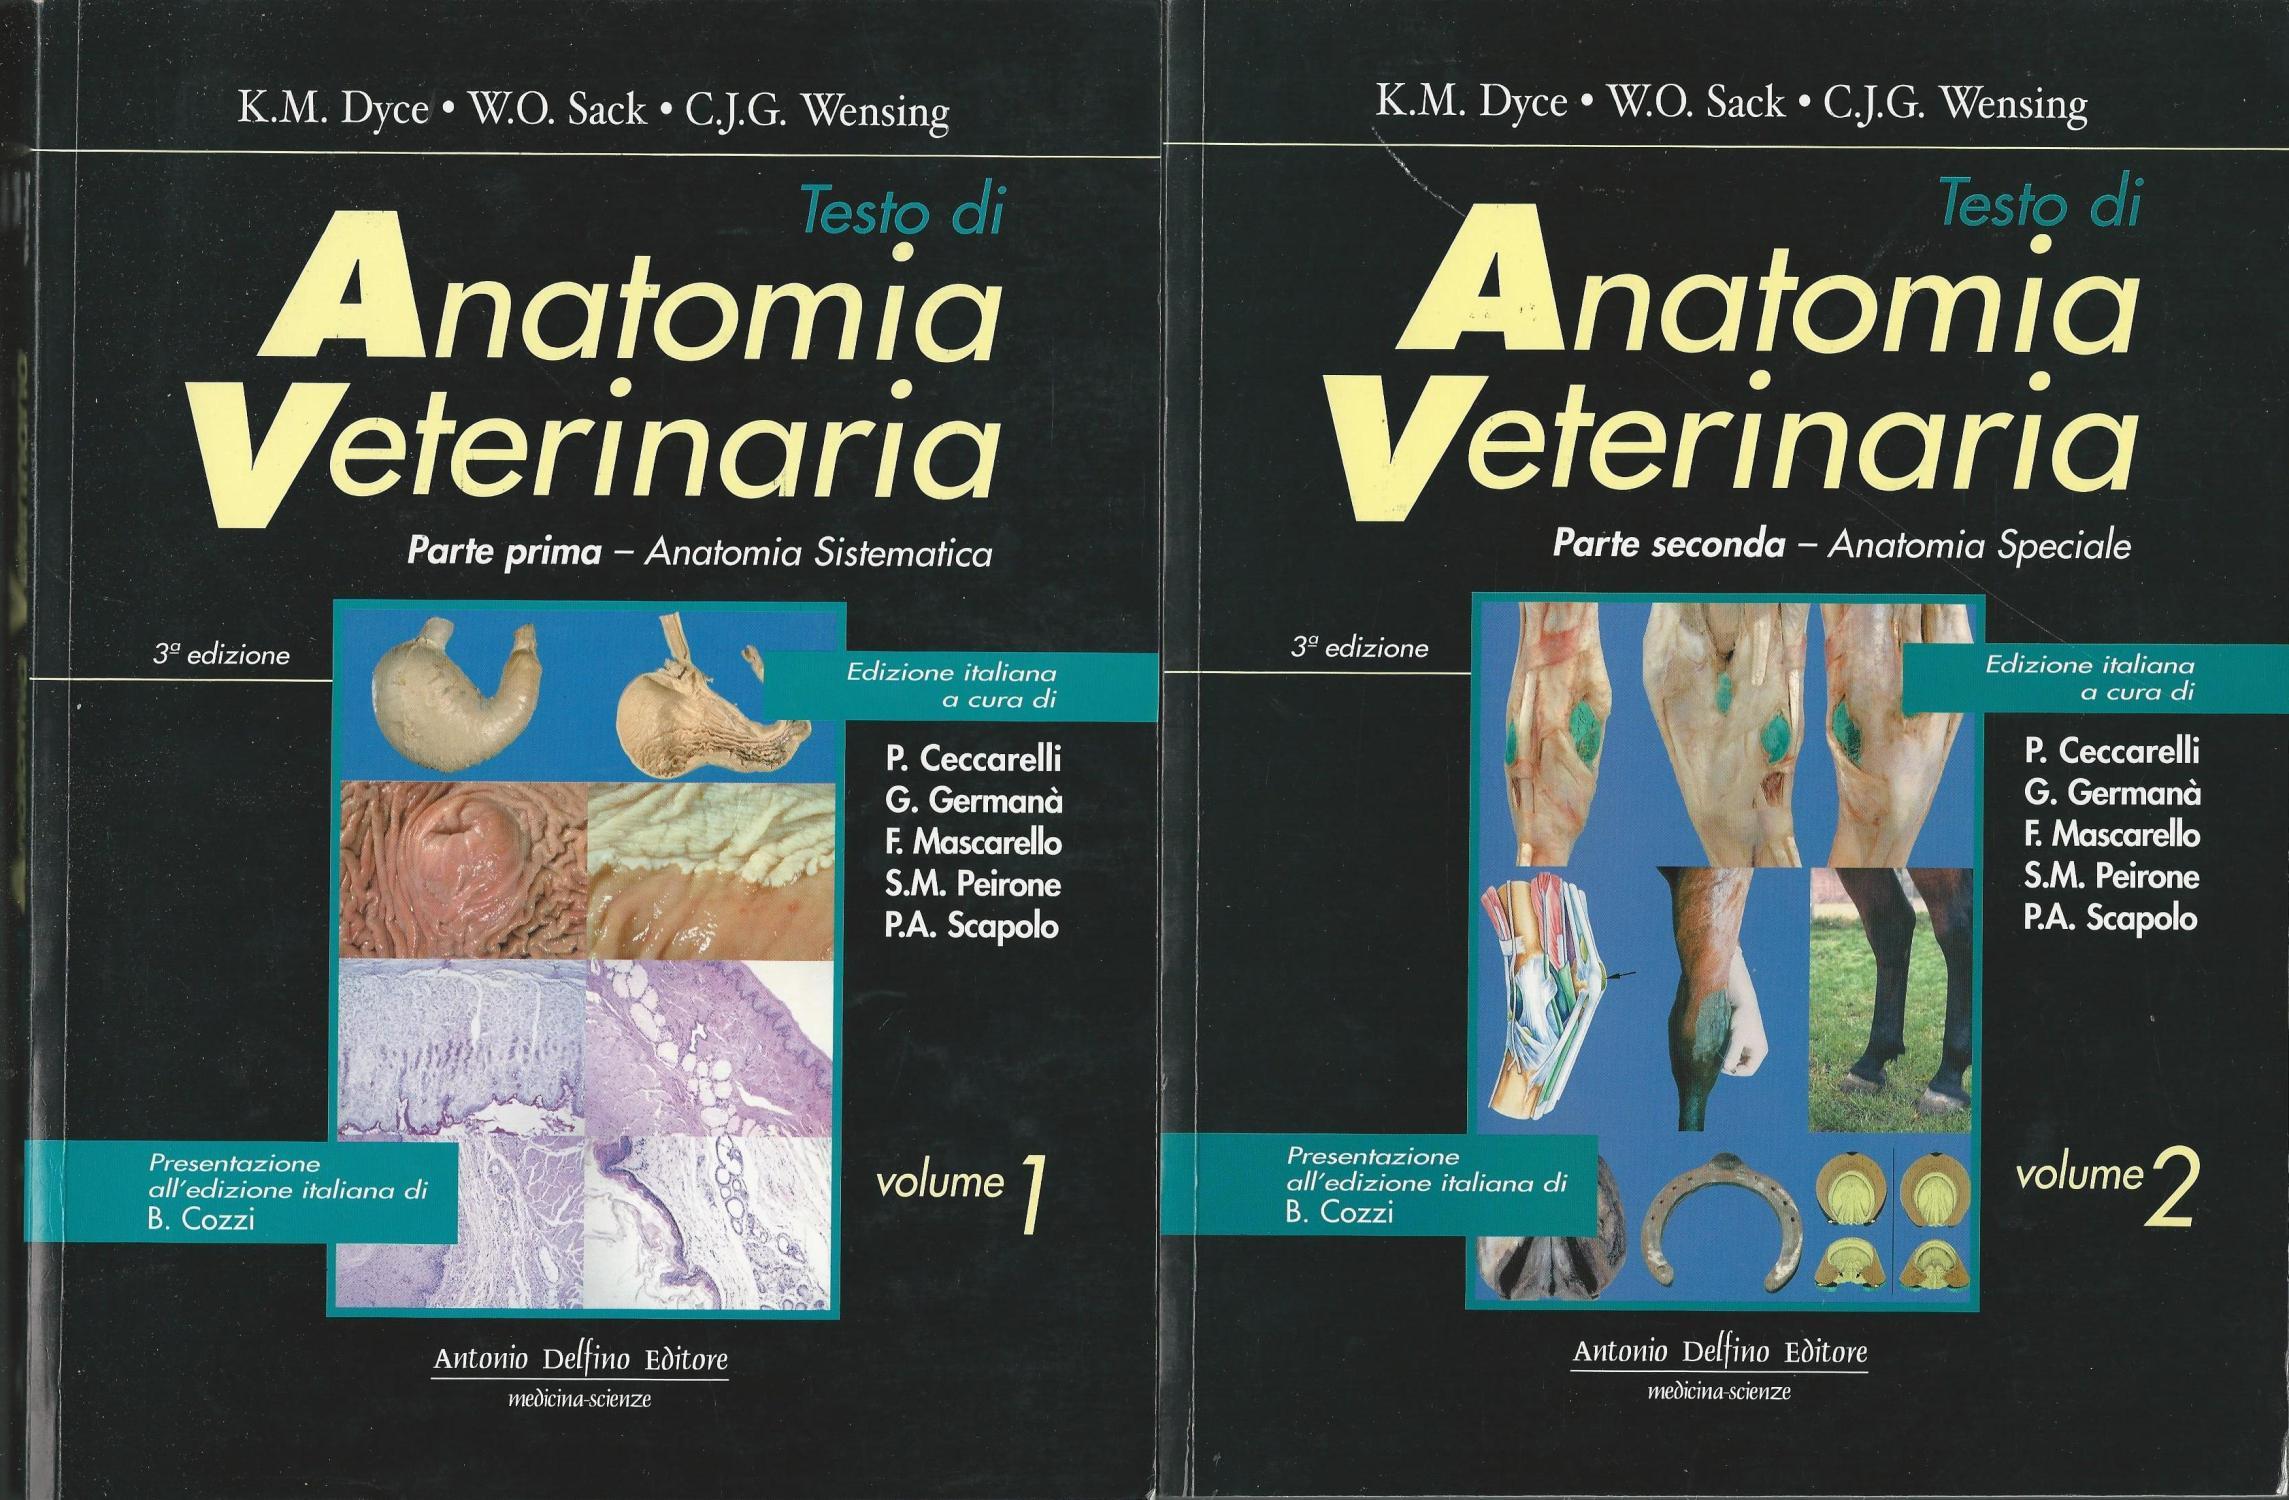 anatomia veterinaria de dyce - Iberlibro